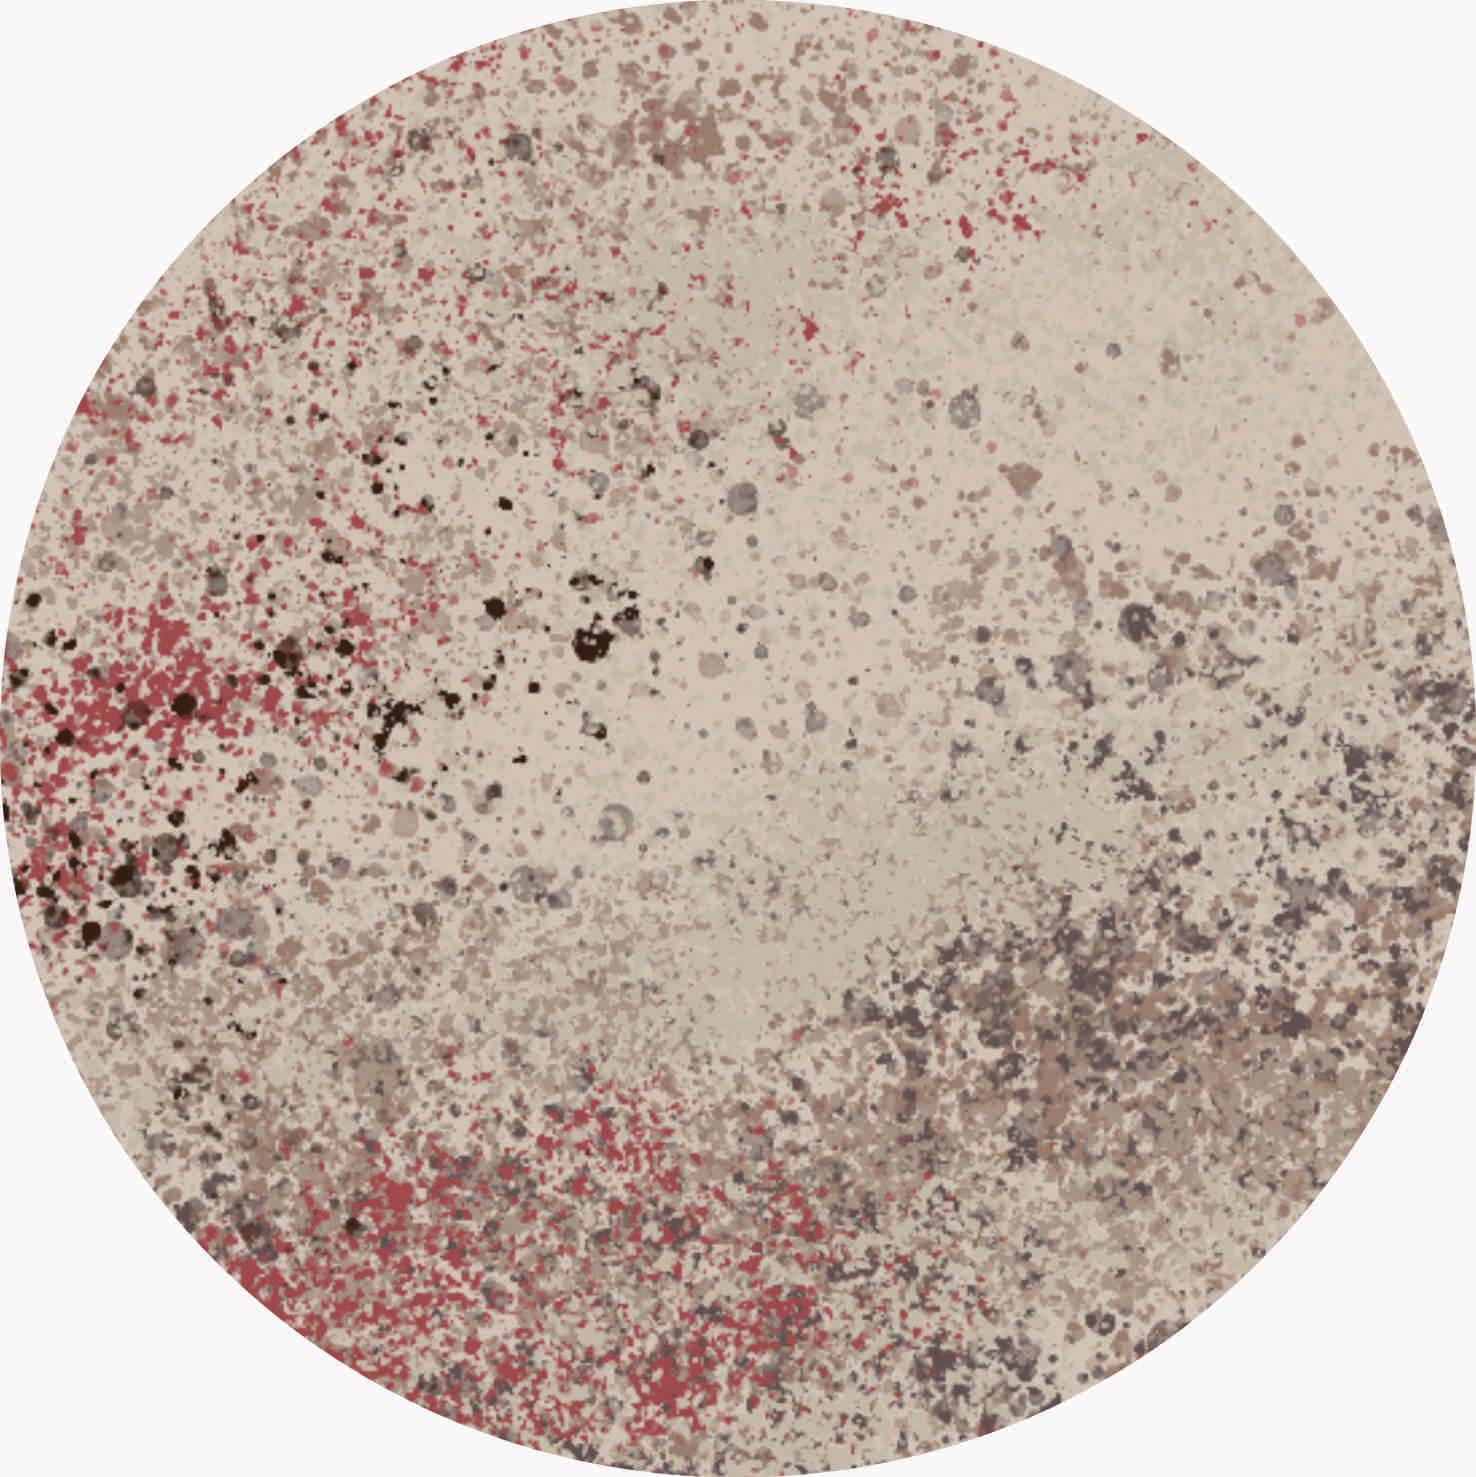 28 | Blossom -Demi Bezuidenhout